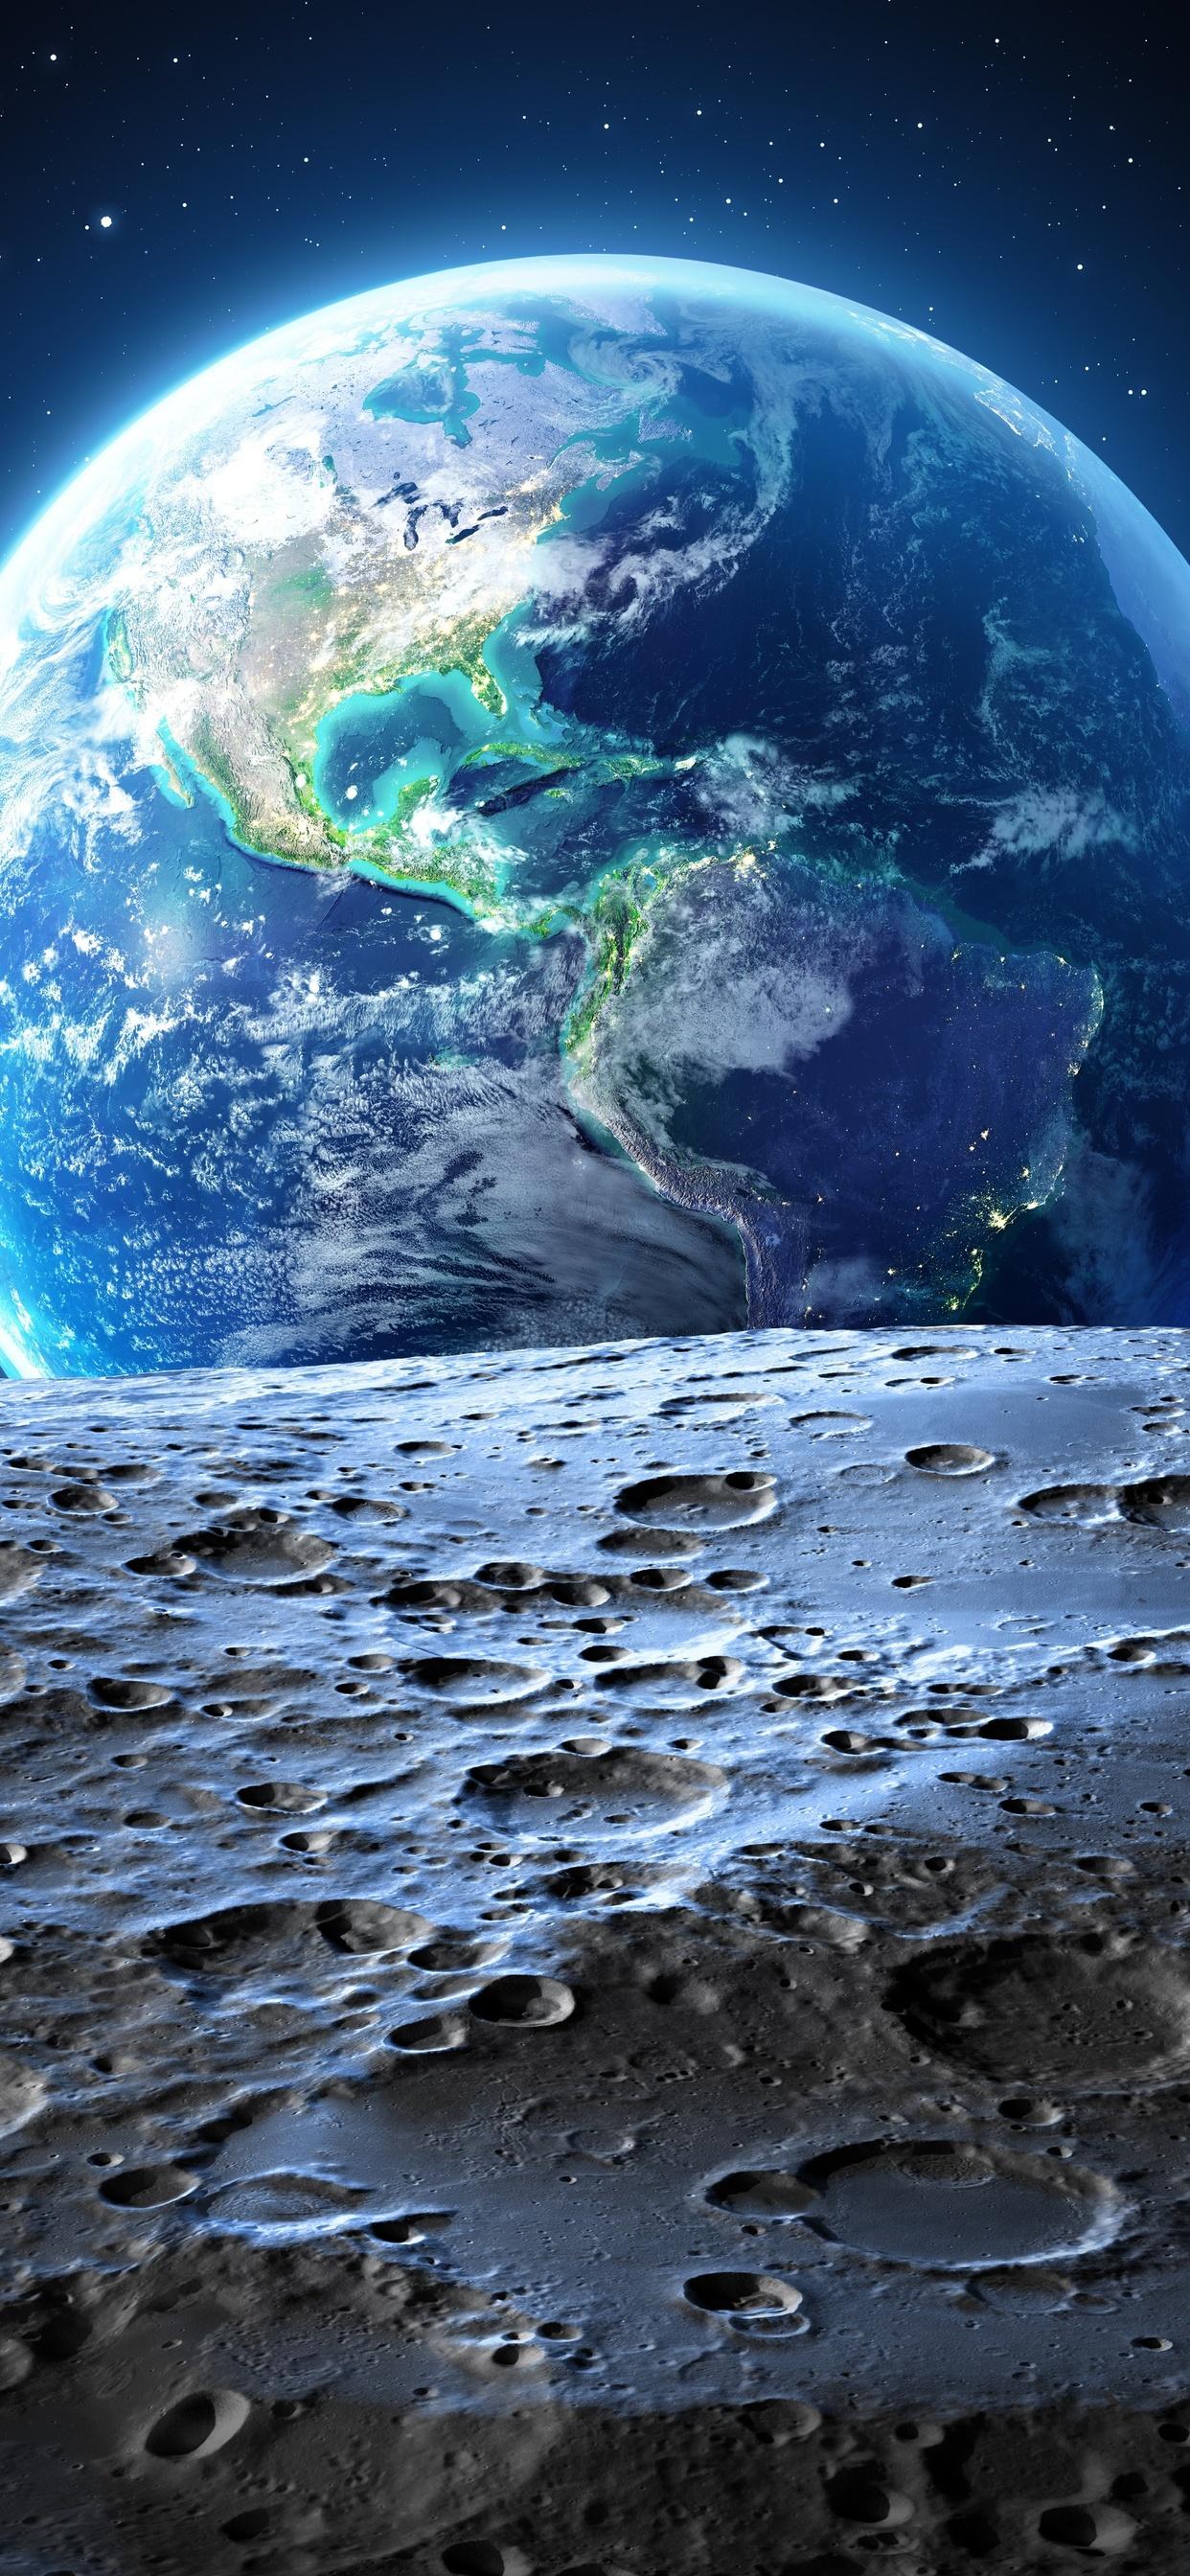 1242x2688 Earth Moon 4k Iphone Xs Max Hd 4k Wallpapers